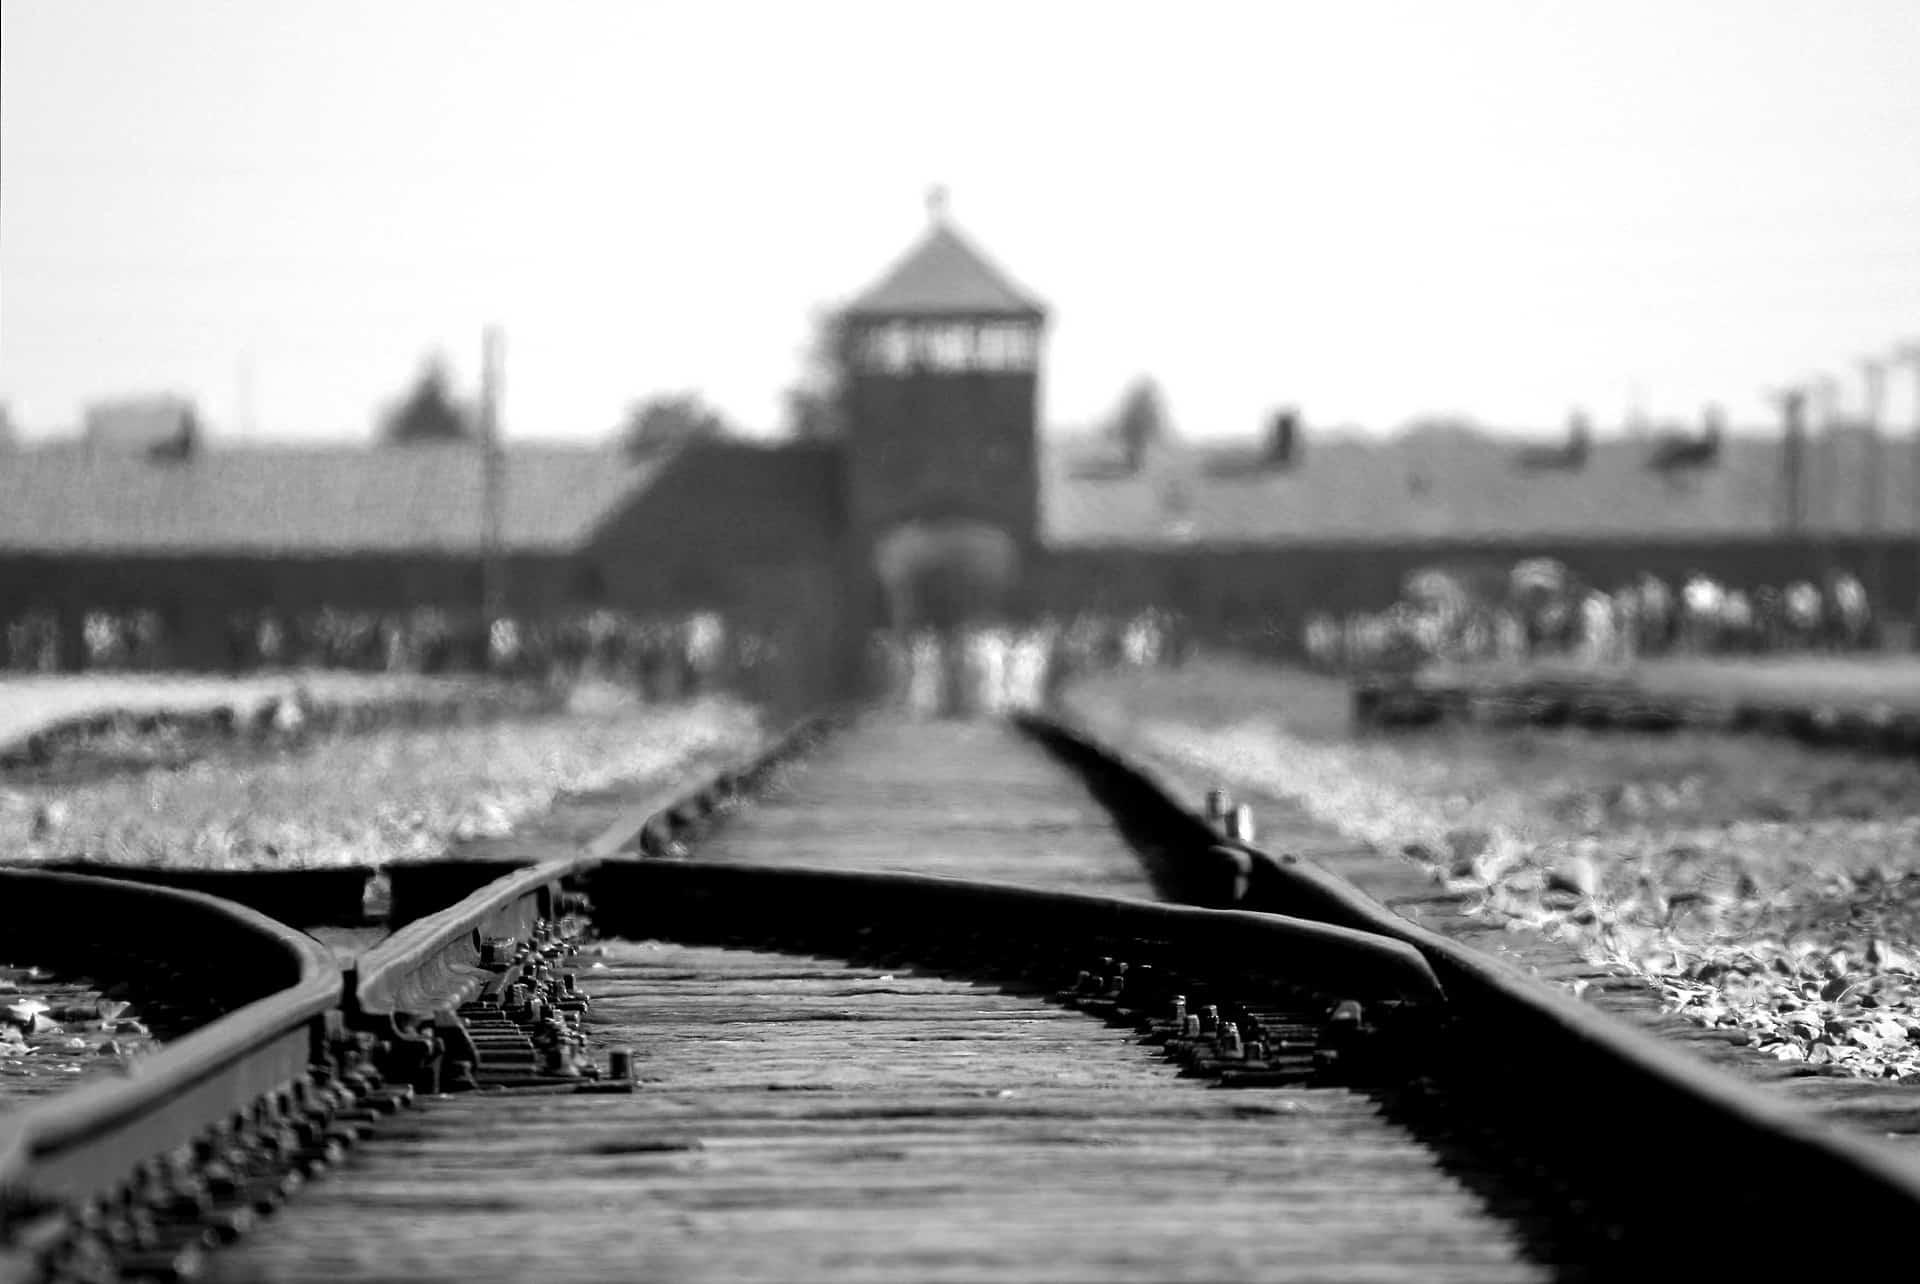 Detalles y curiosidades de Auschwitz